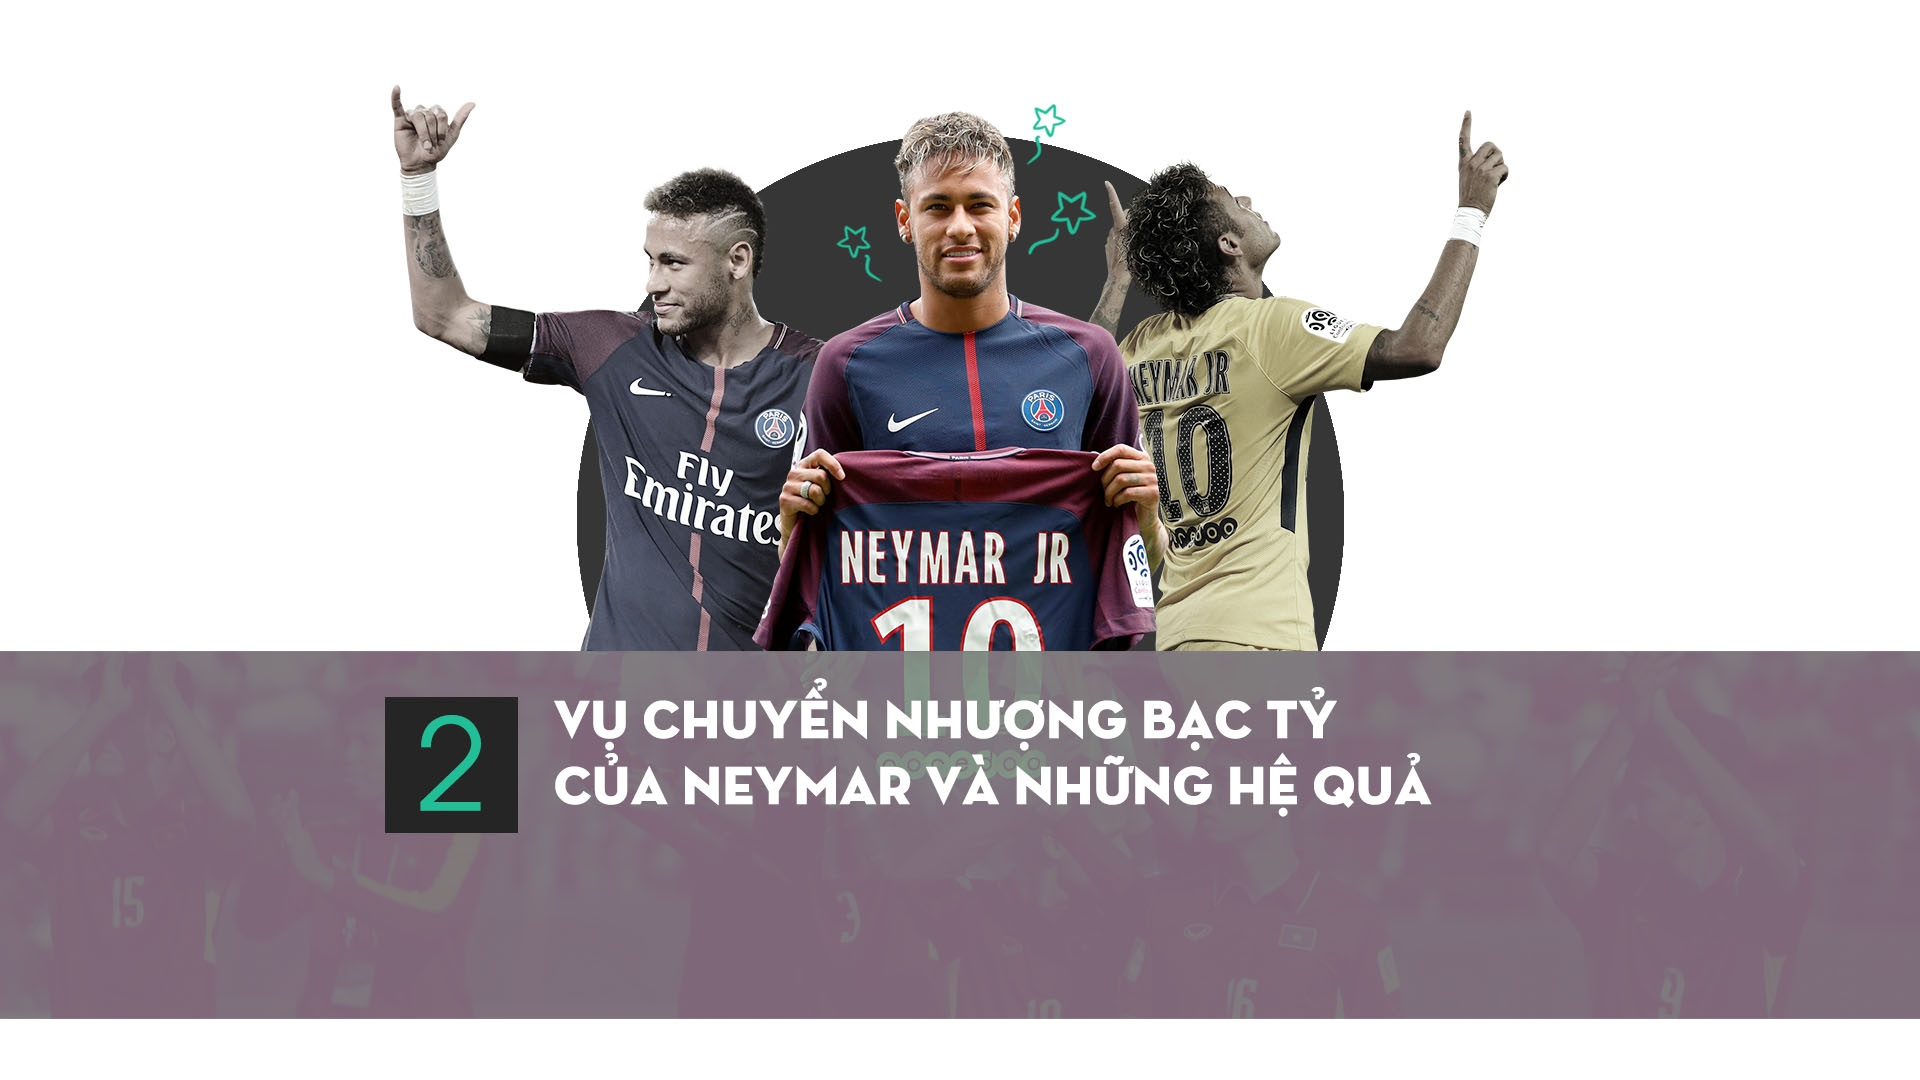 The thao the gioi 2017: Bom tan Neymar, CR7 va tran boxing bac ty hinh anh 7